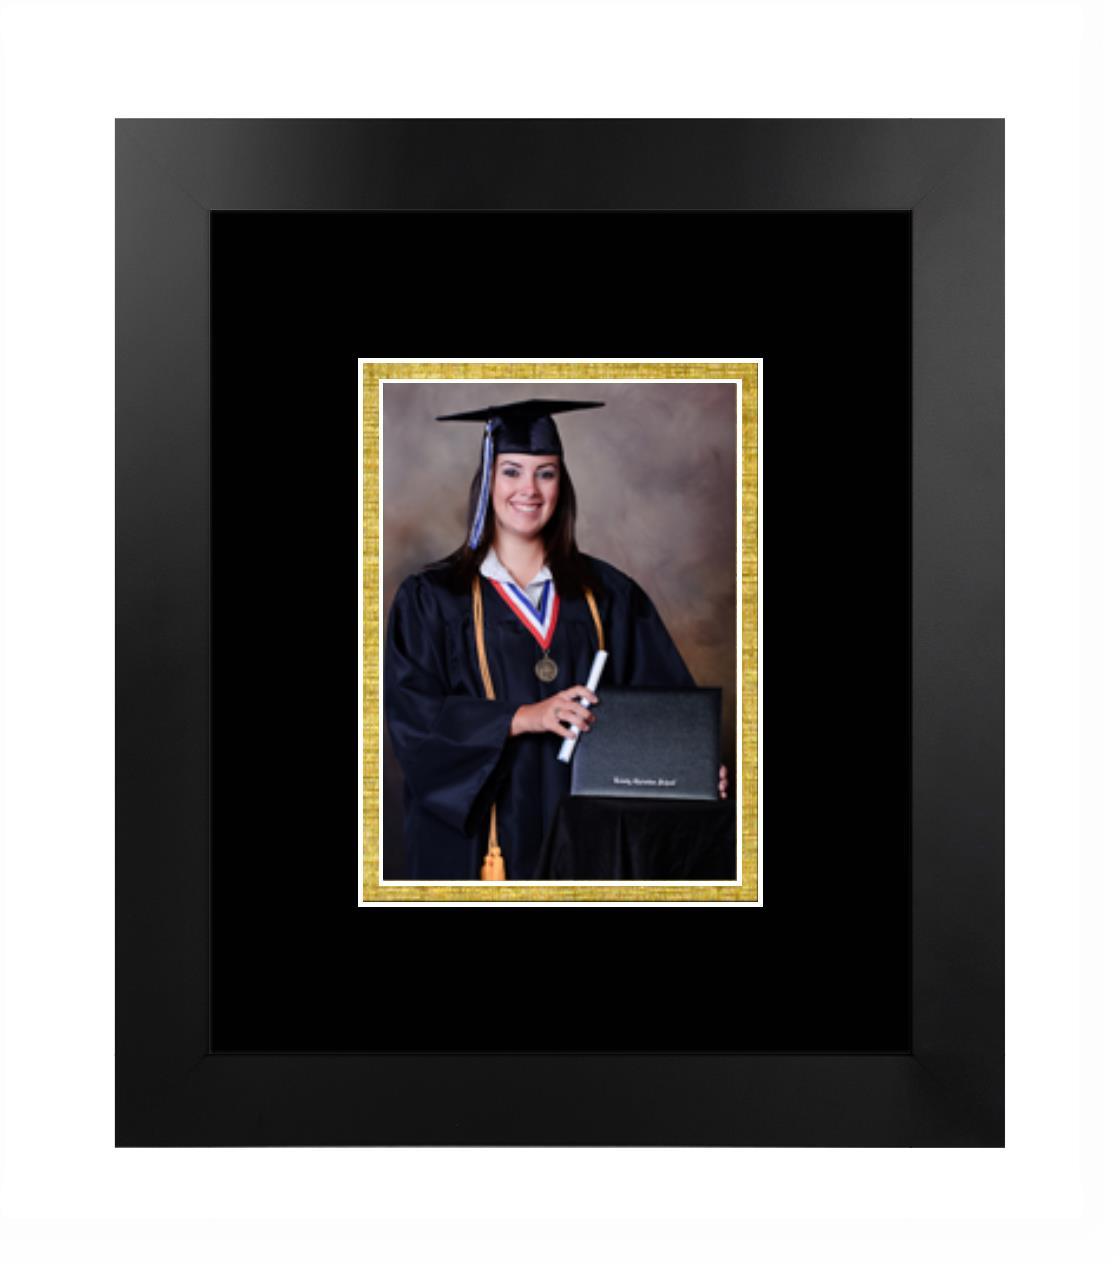 5x7 Portrait Frame in Manhattan Black with Black & Gold Mats